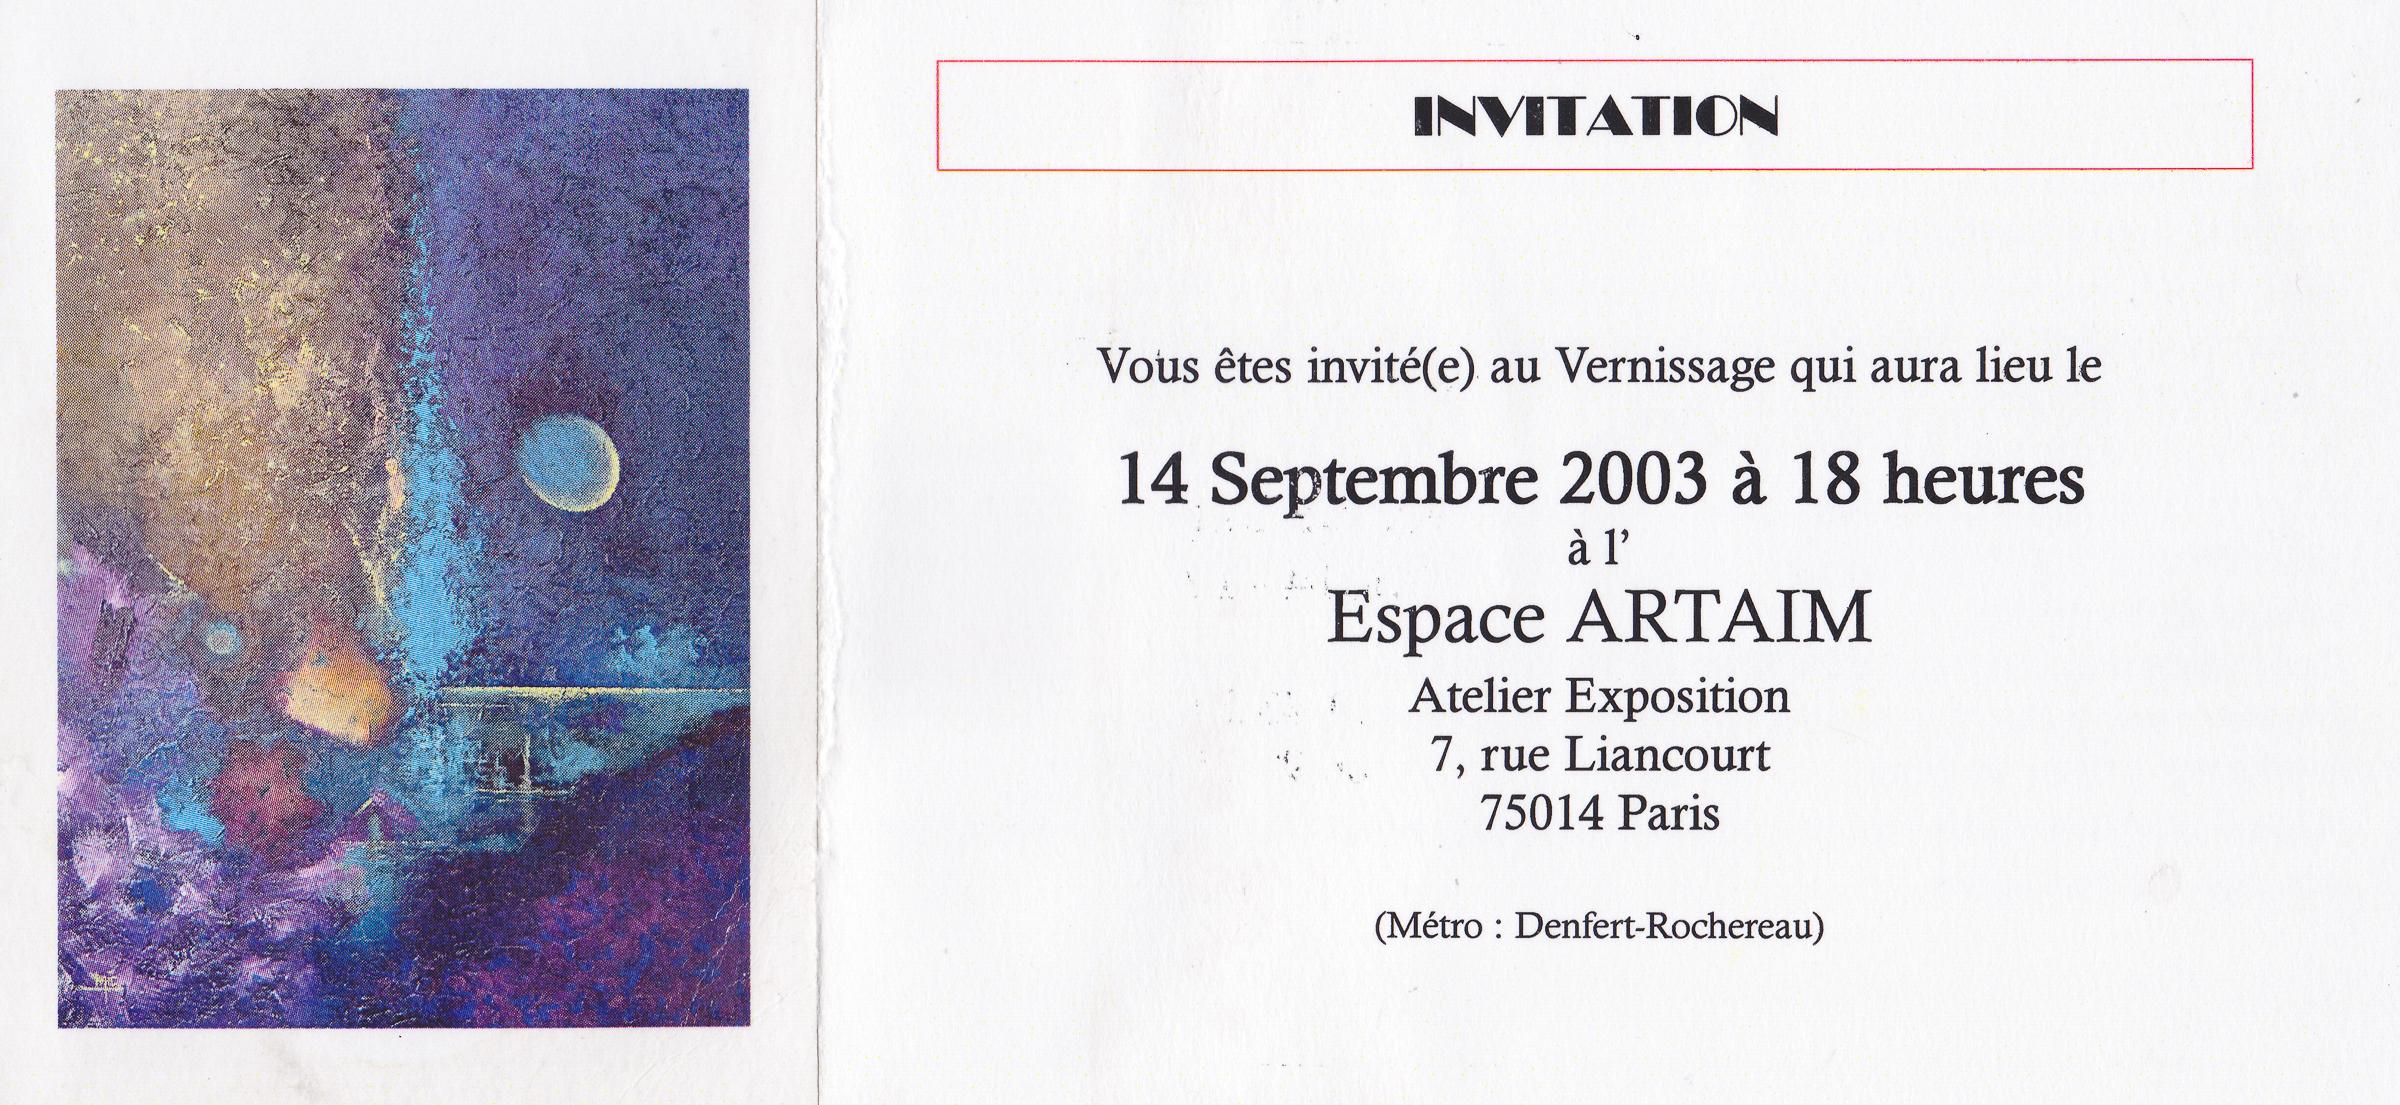 association artaim expo grid-17.jpg